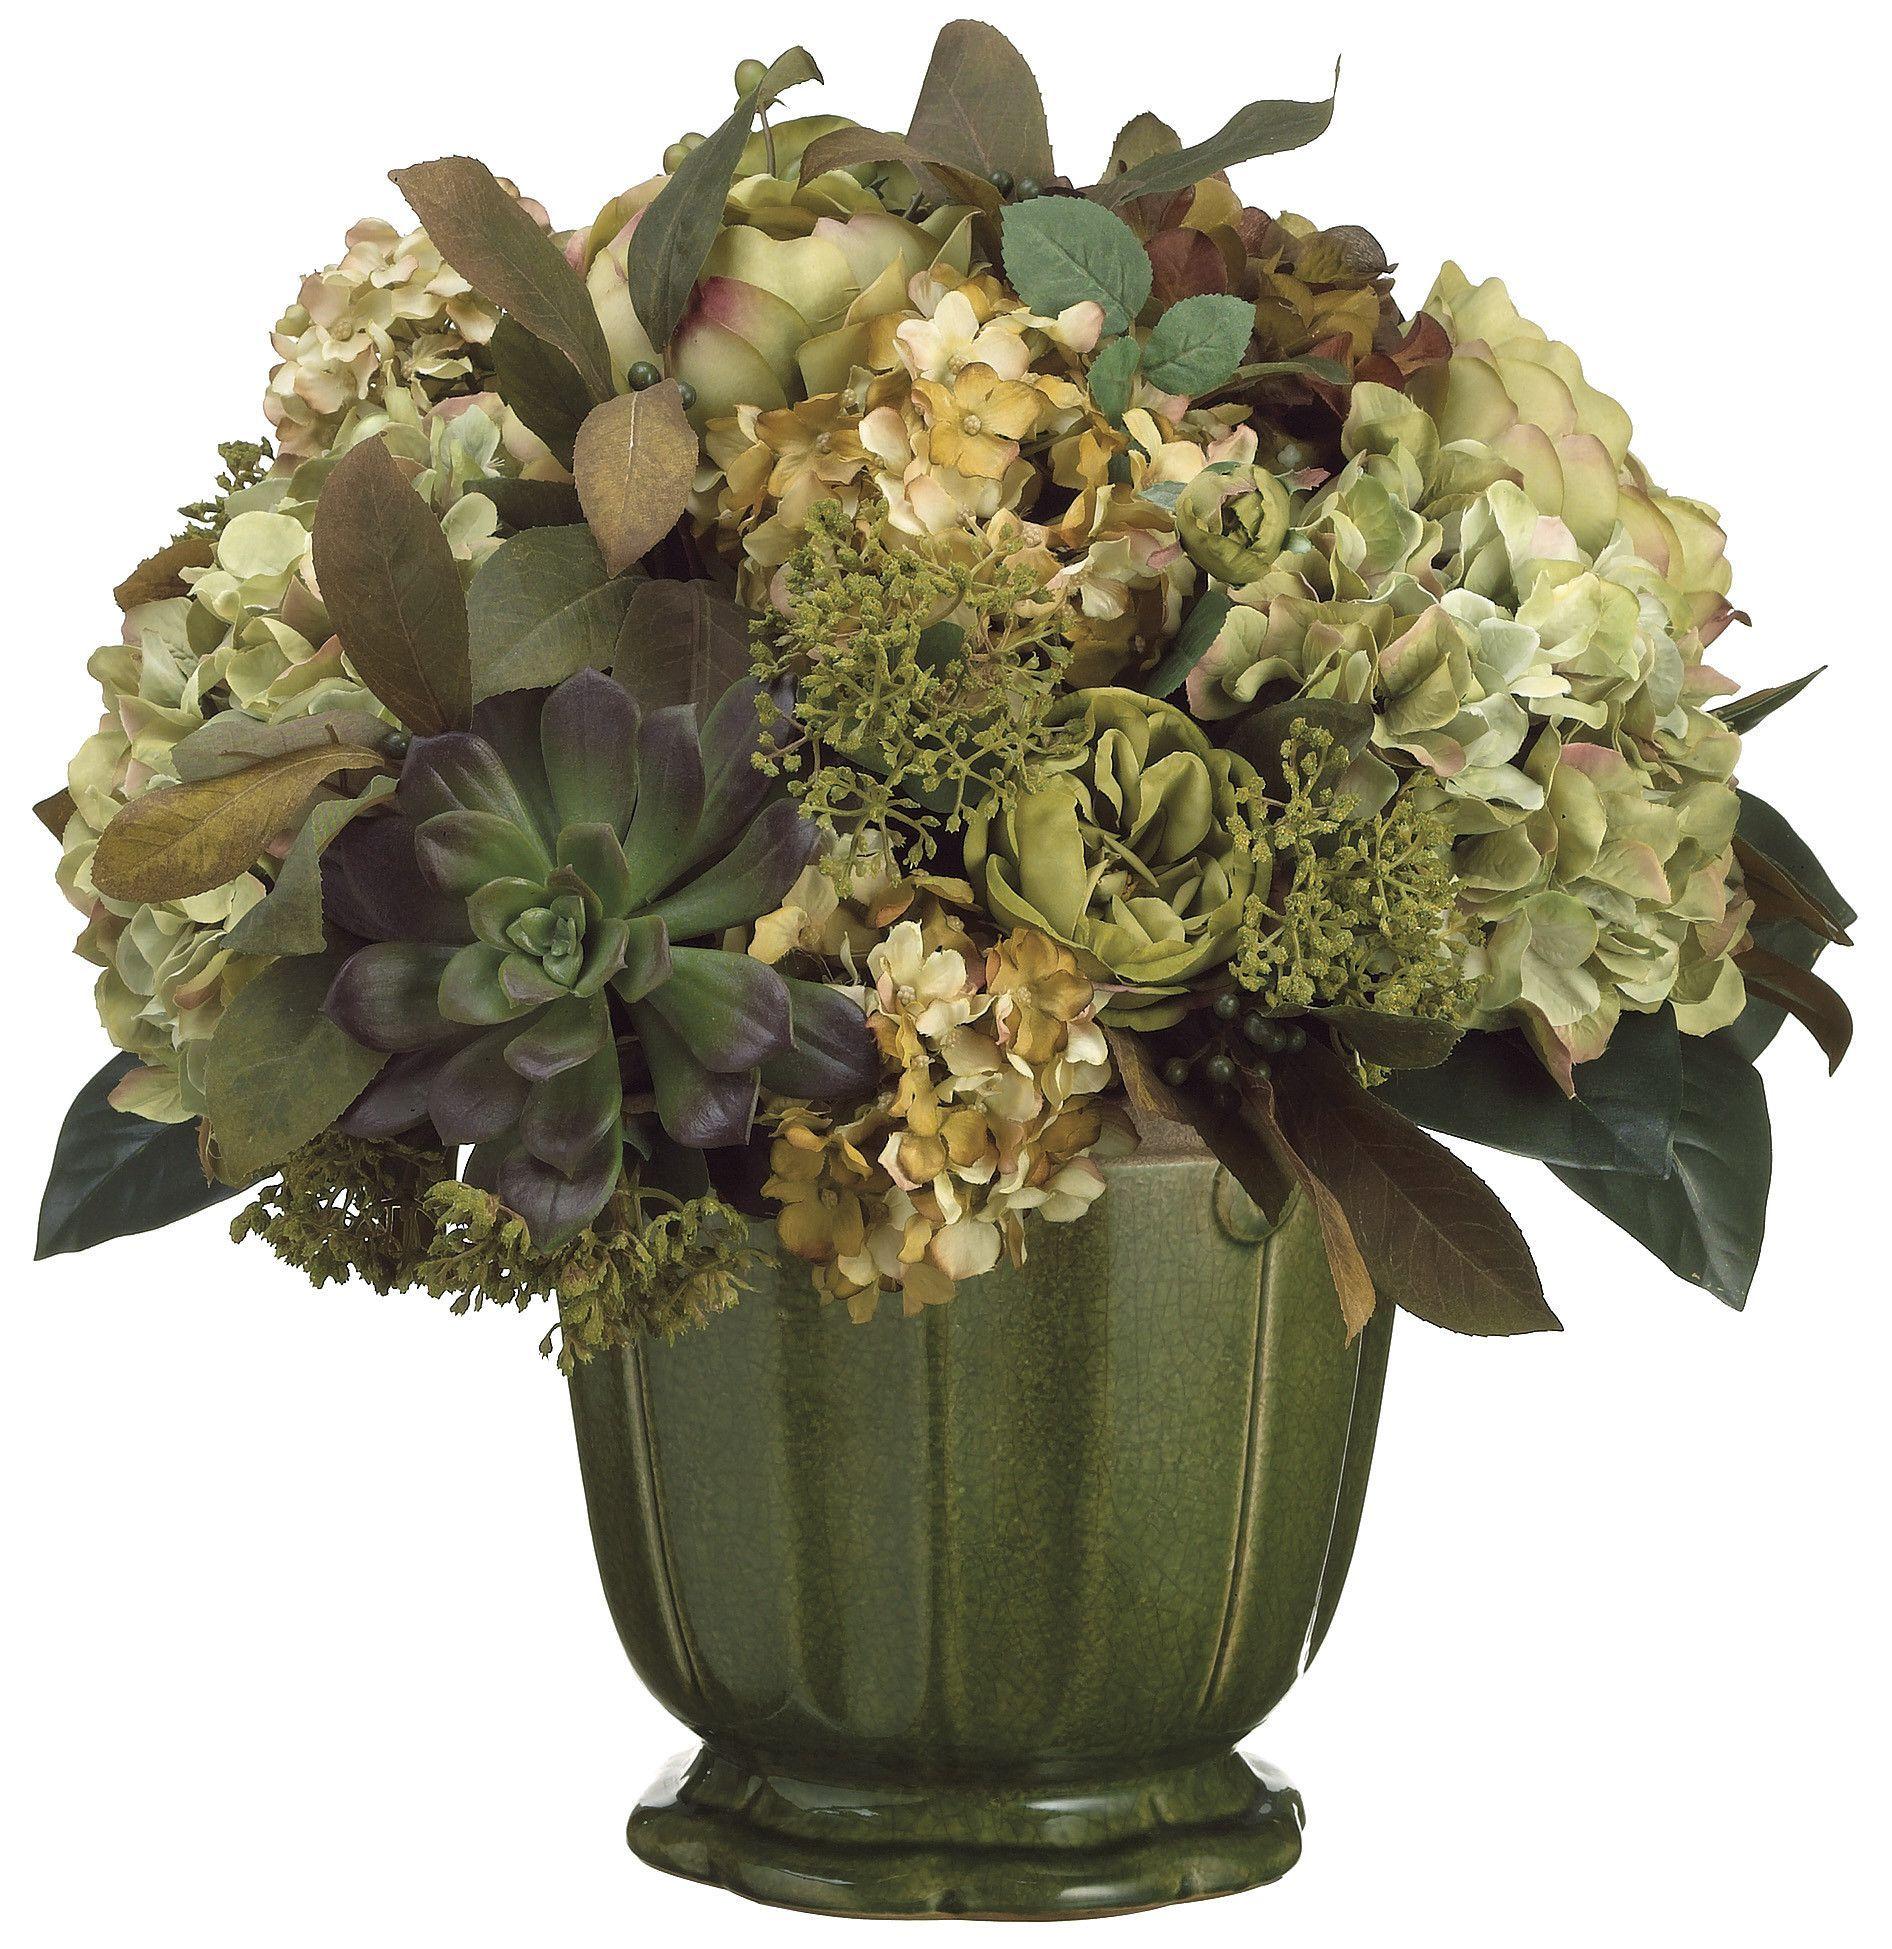 Ceramic Pot Size 18t X 18w X 18d Weight 924 Lb Color